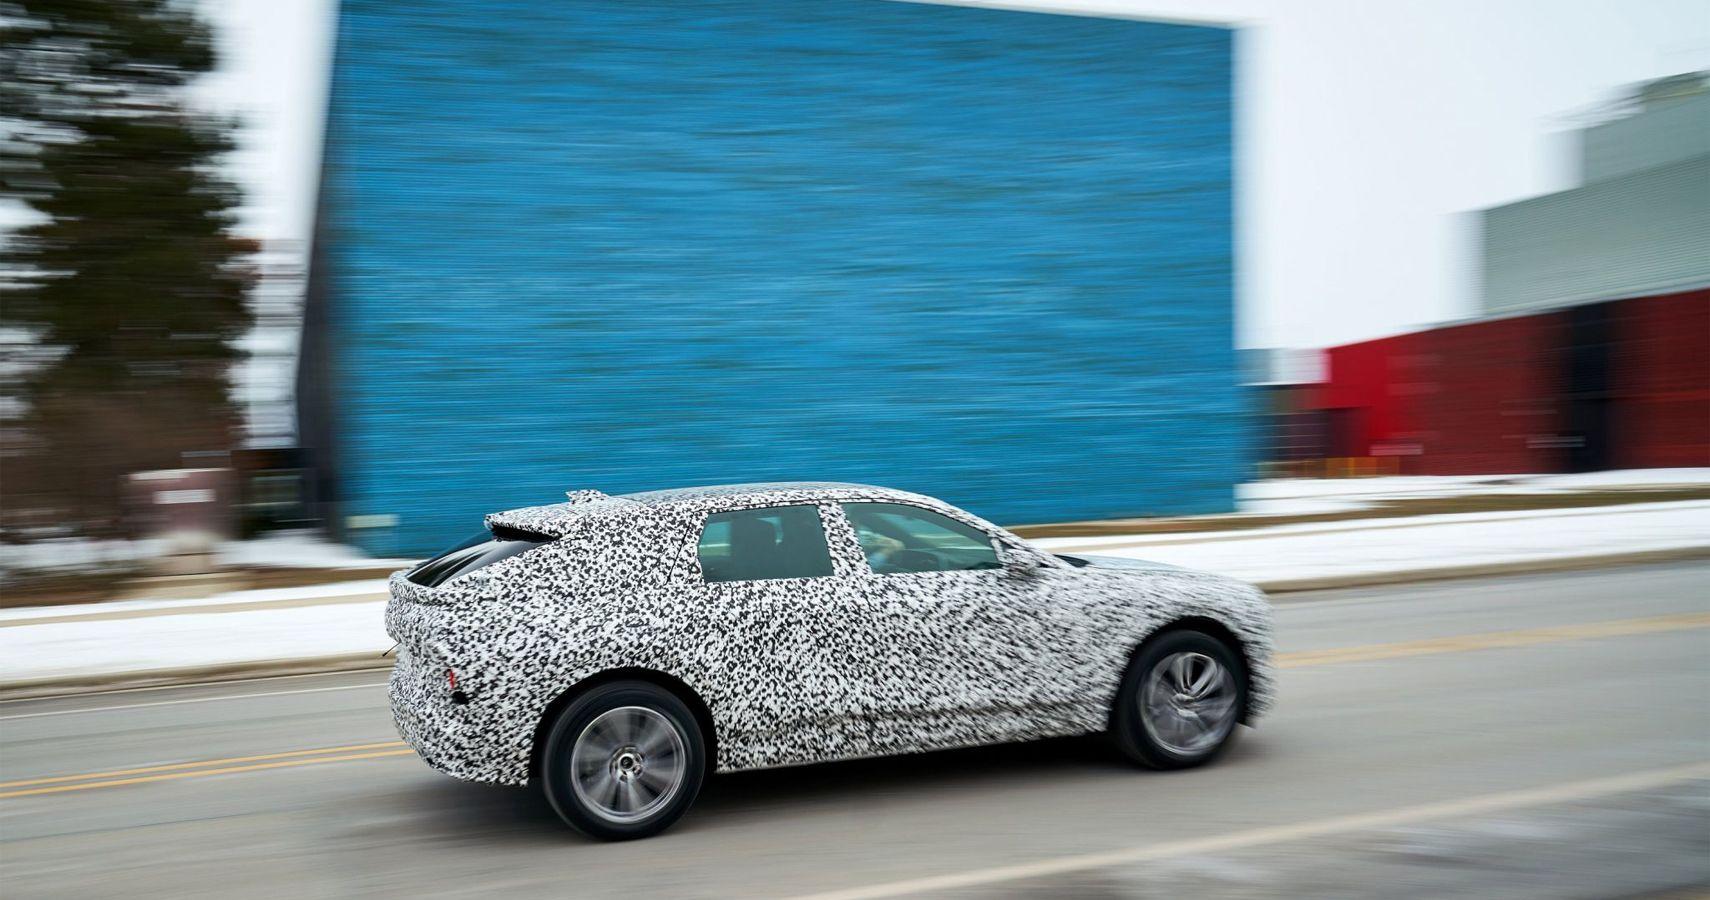 Seen But Not Heard: Cadillac Lyriq EV Spotted Road Testing